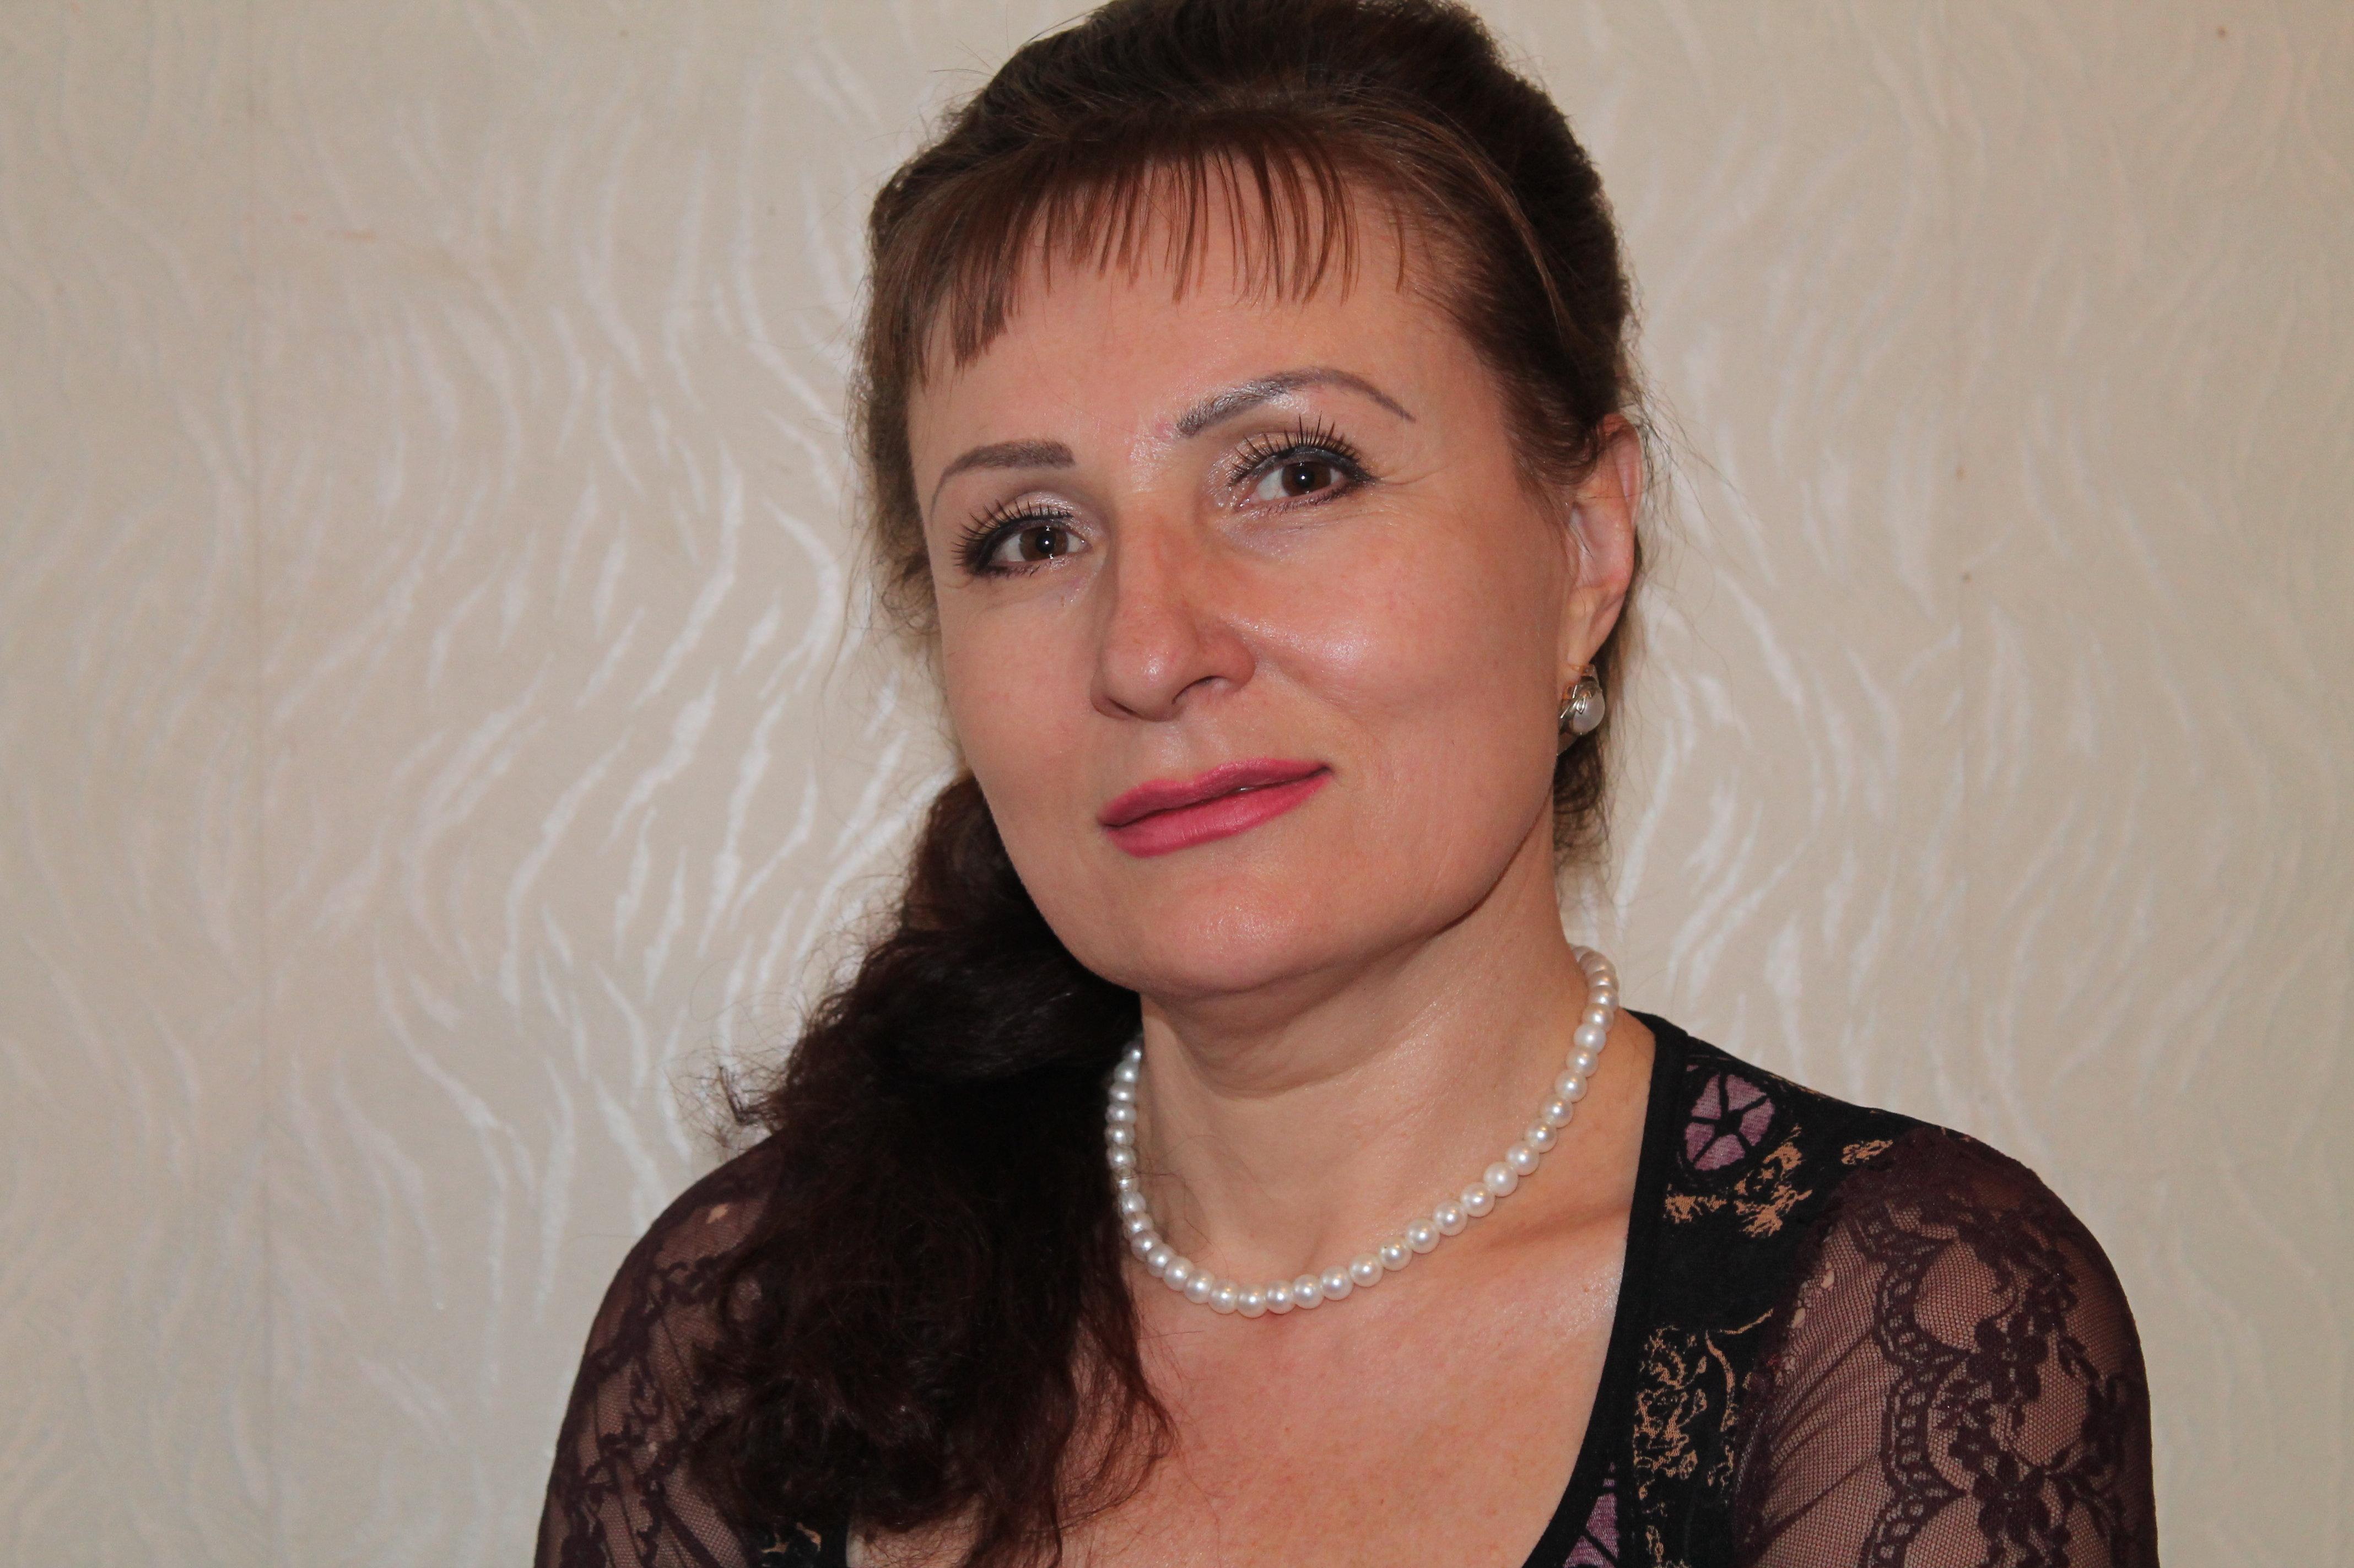 Ирина Абдраимова, қазақстандық астролог